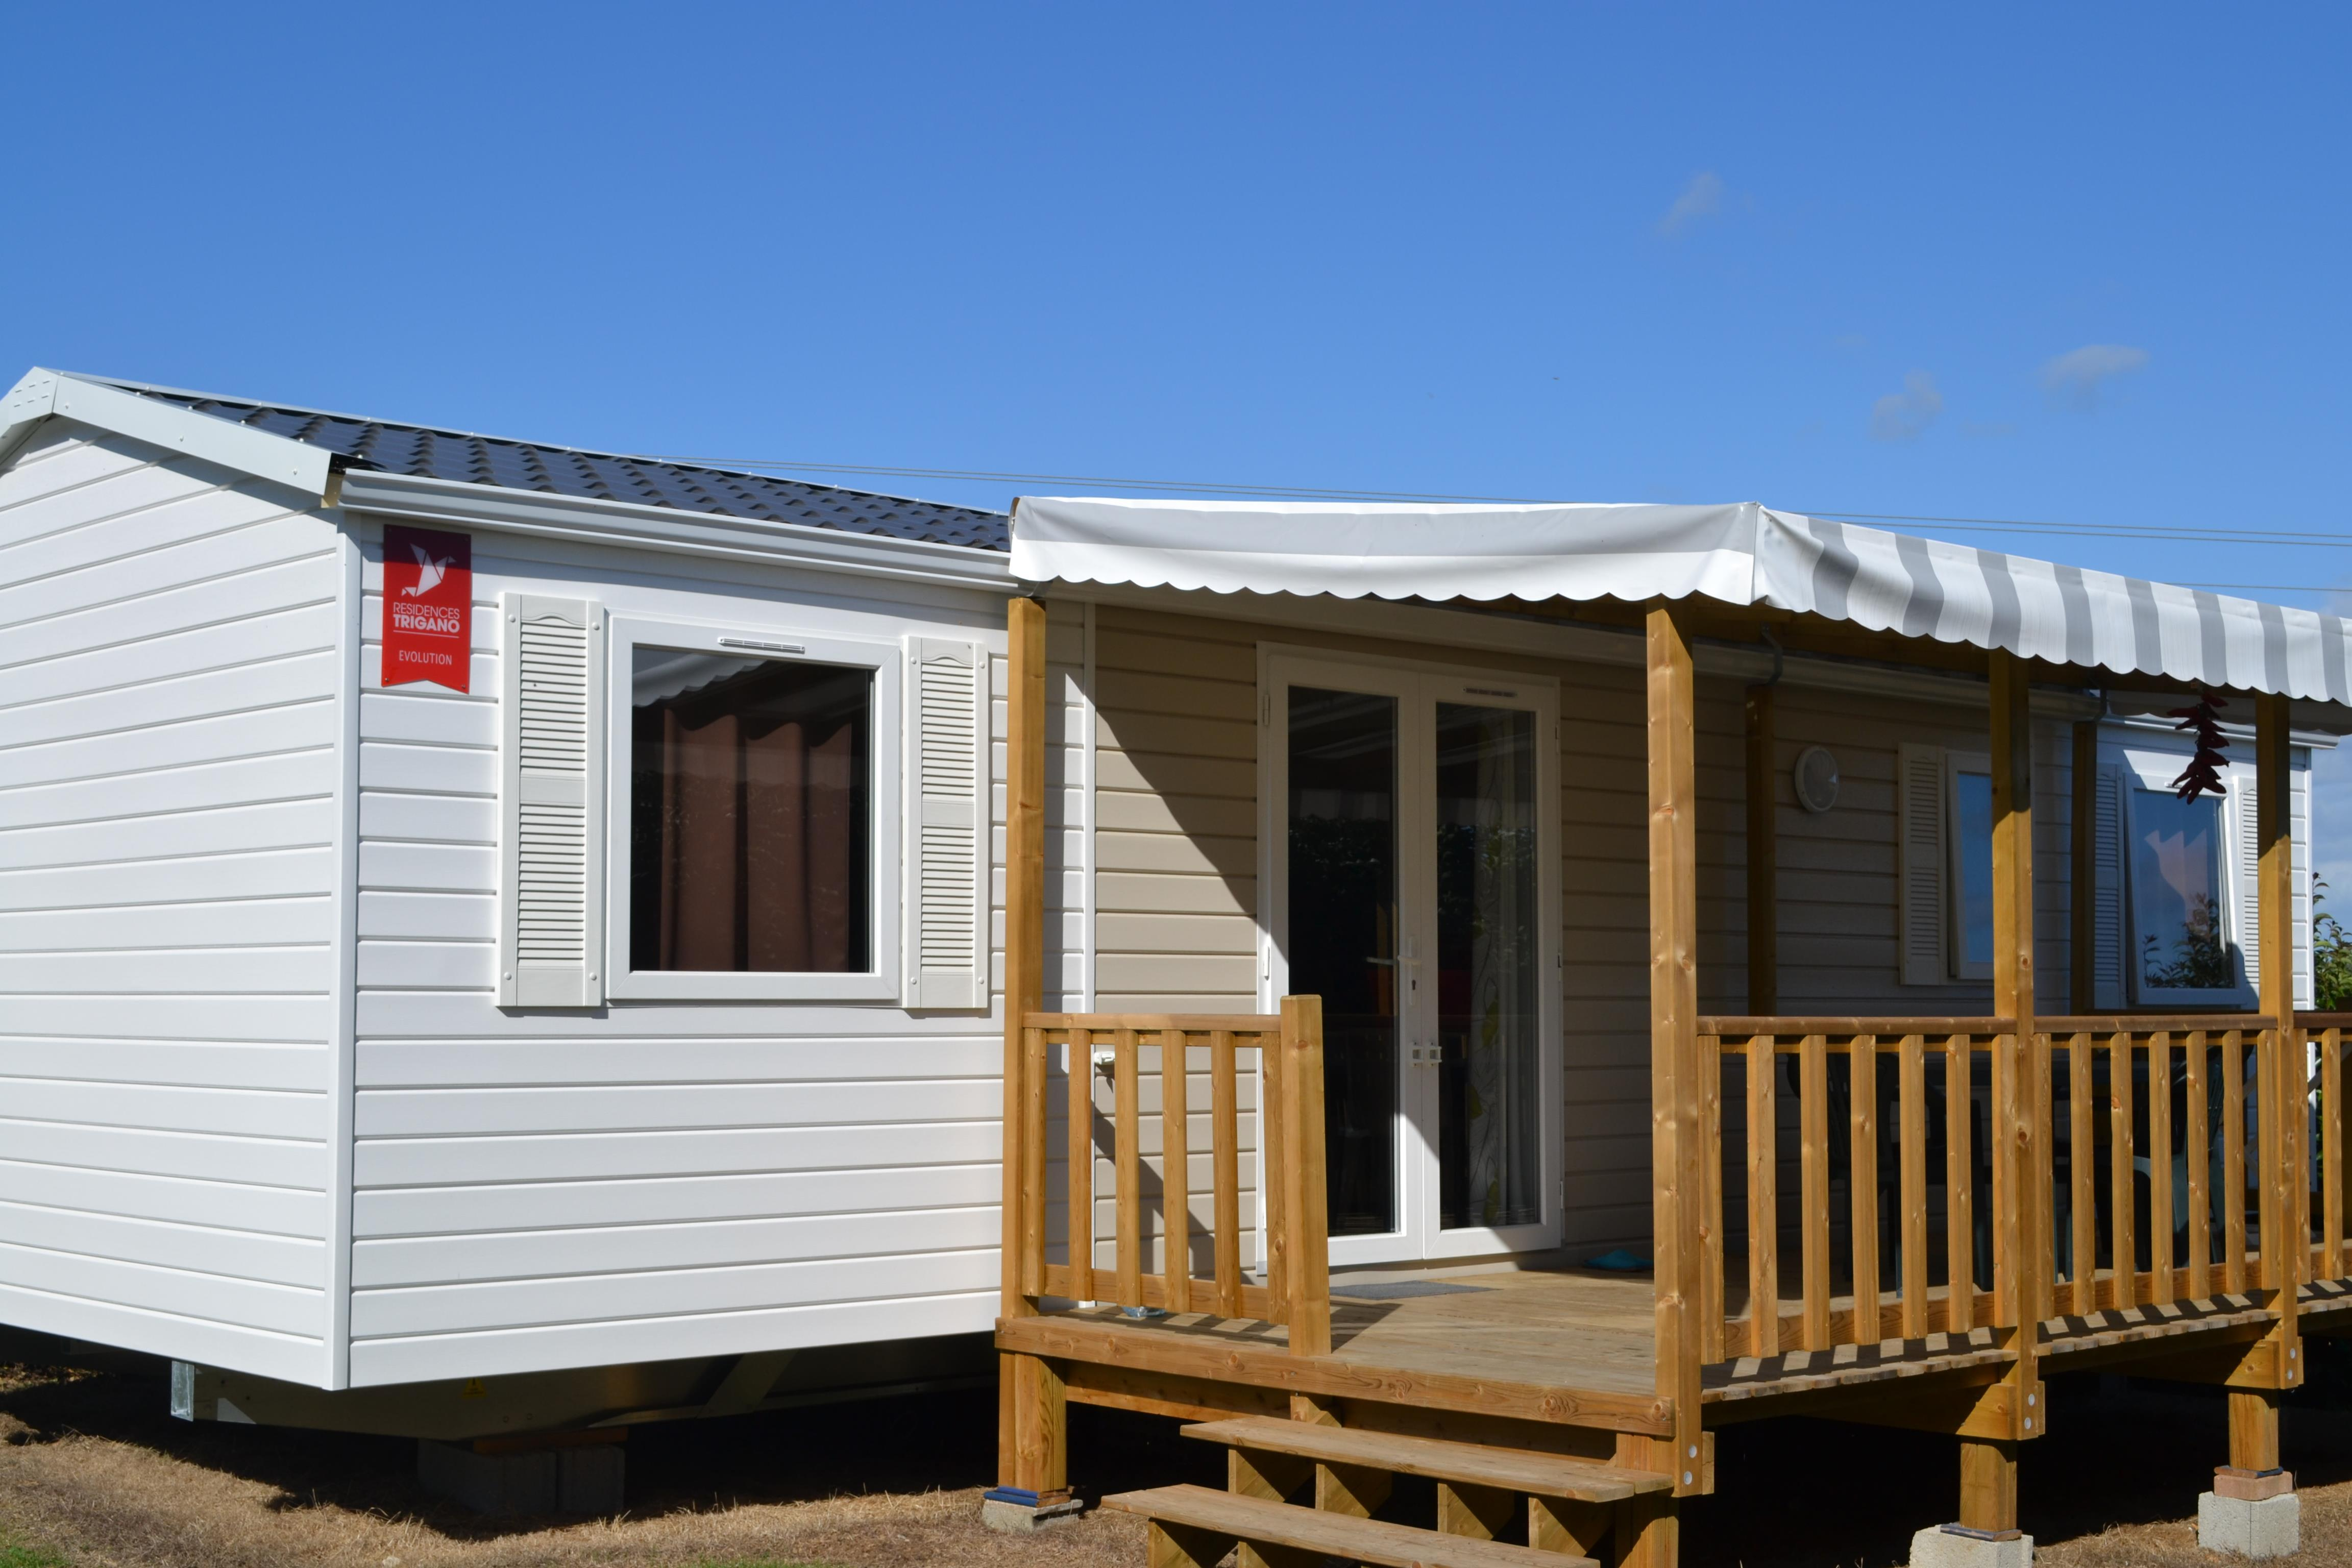 Location - Mobilhome Confort+ (4 Chambres) Avec Terrasse 40 M² - Camping Les Jardins de Kergal